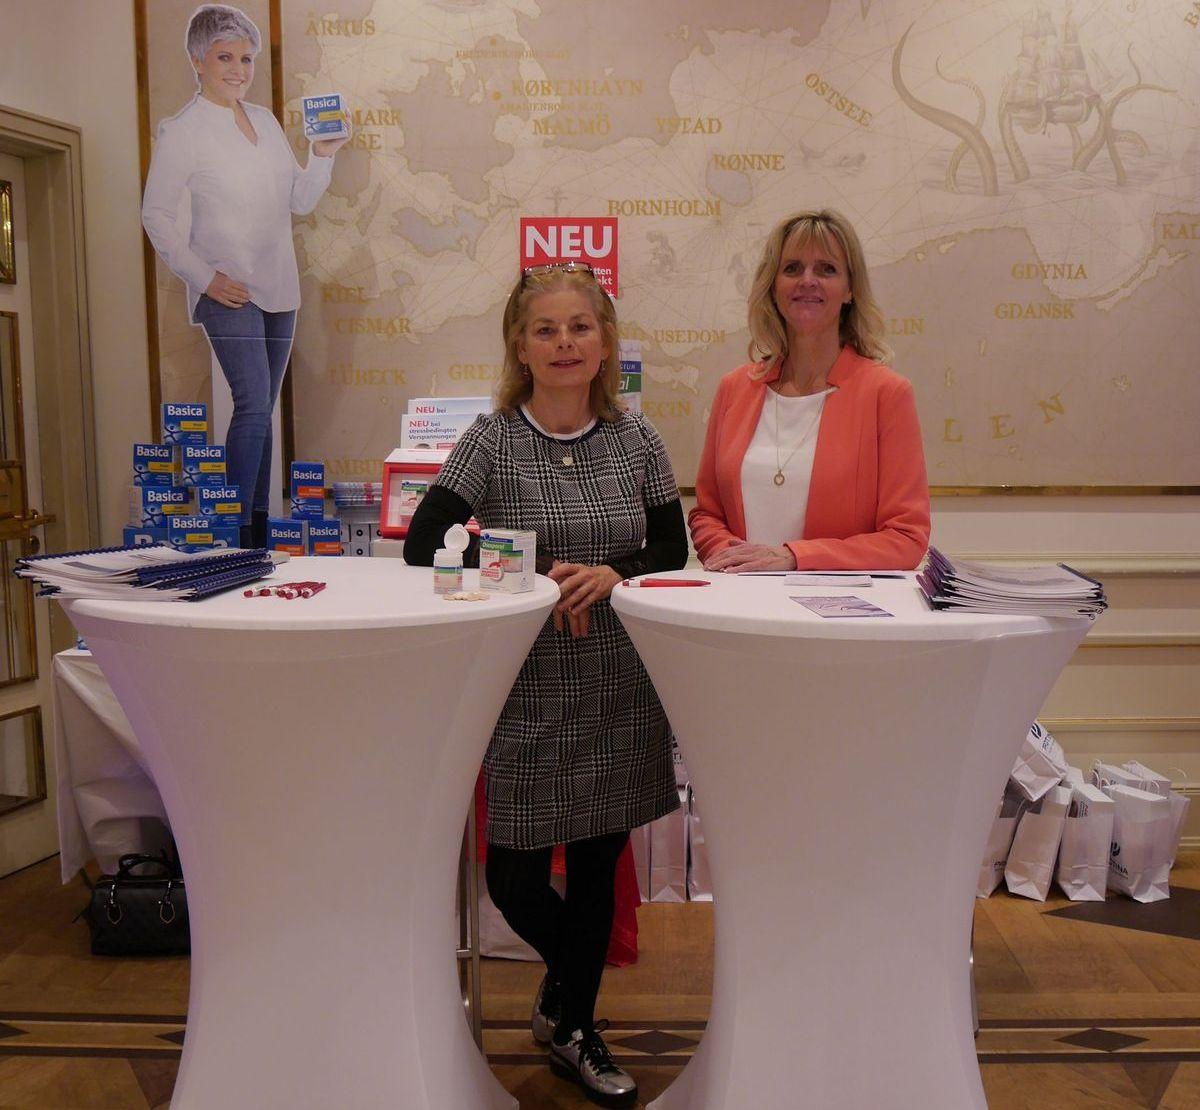 Andrea Beringer (links) von Protina kam mit Basica und Magnesium-Diasporal Depot nach Hamburg